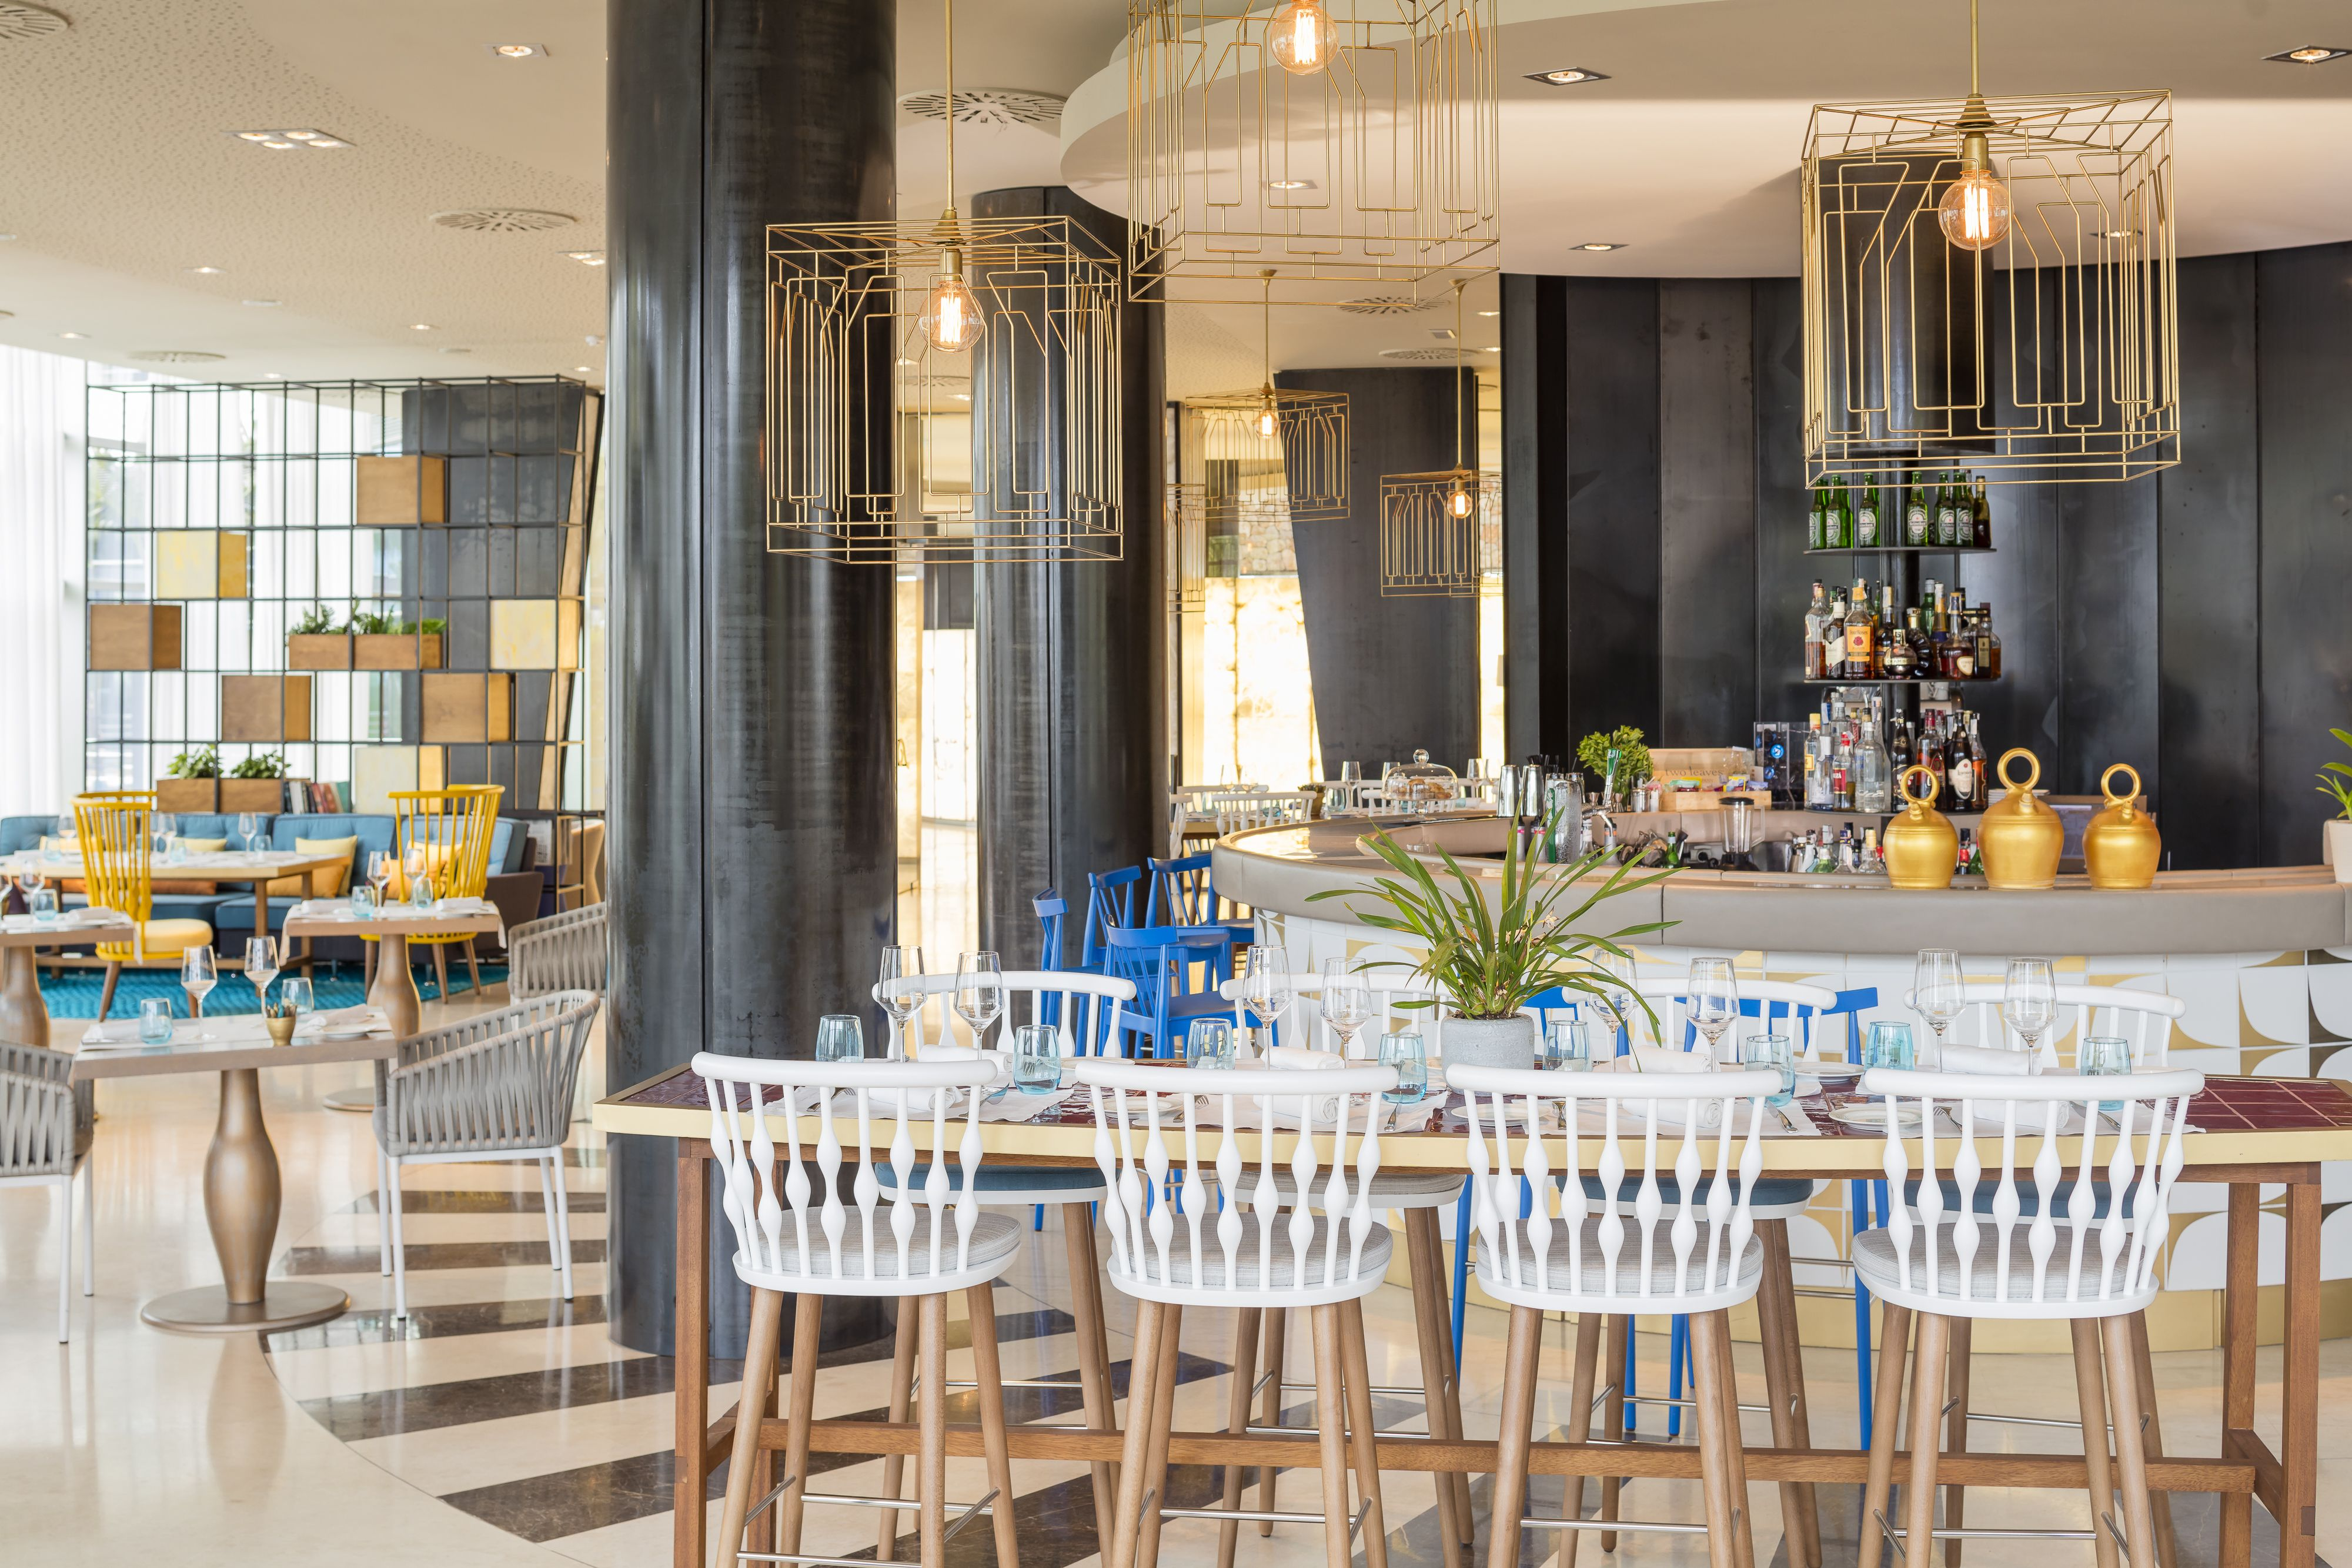 Restaurante En Ibiza Santa Eulalia Aguas De Ibiza Sky Wedding  # Muebles Tiziano Santa Cruz